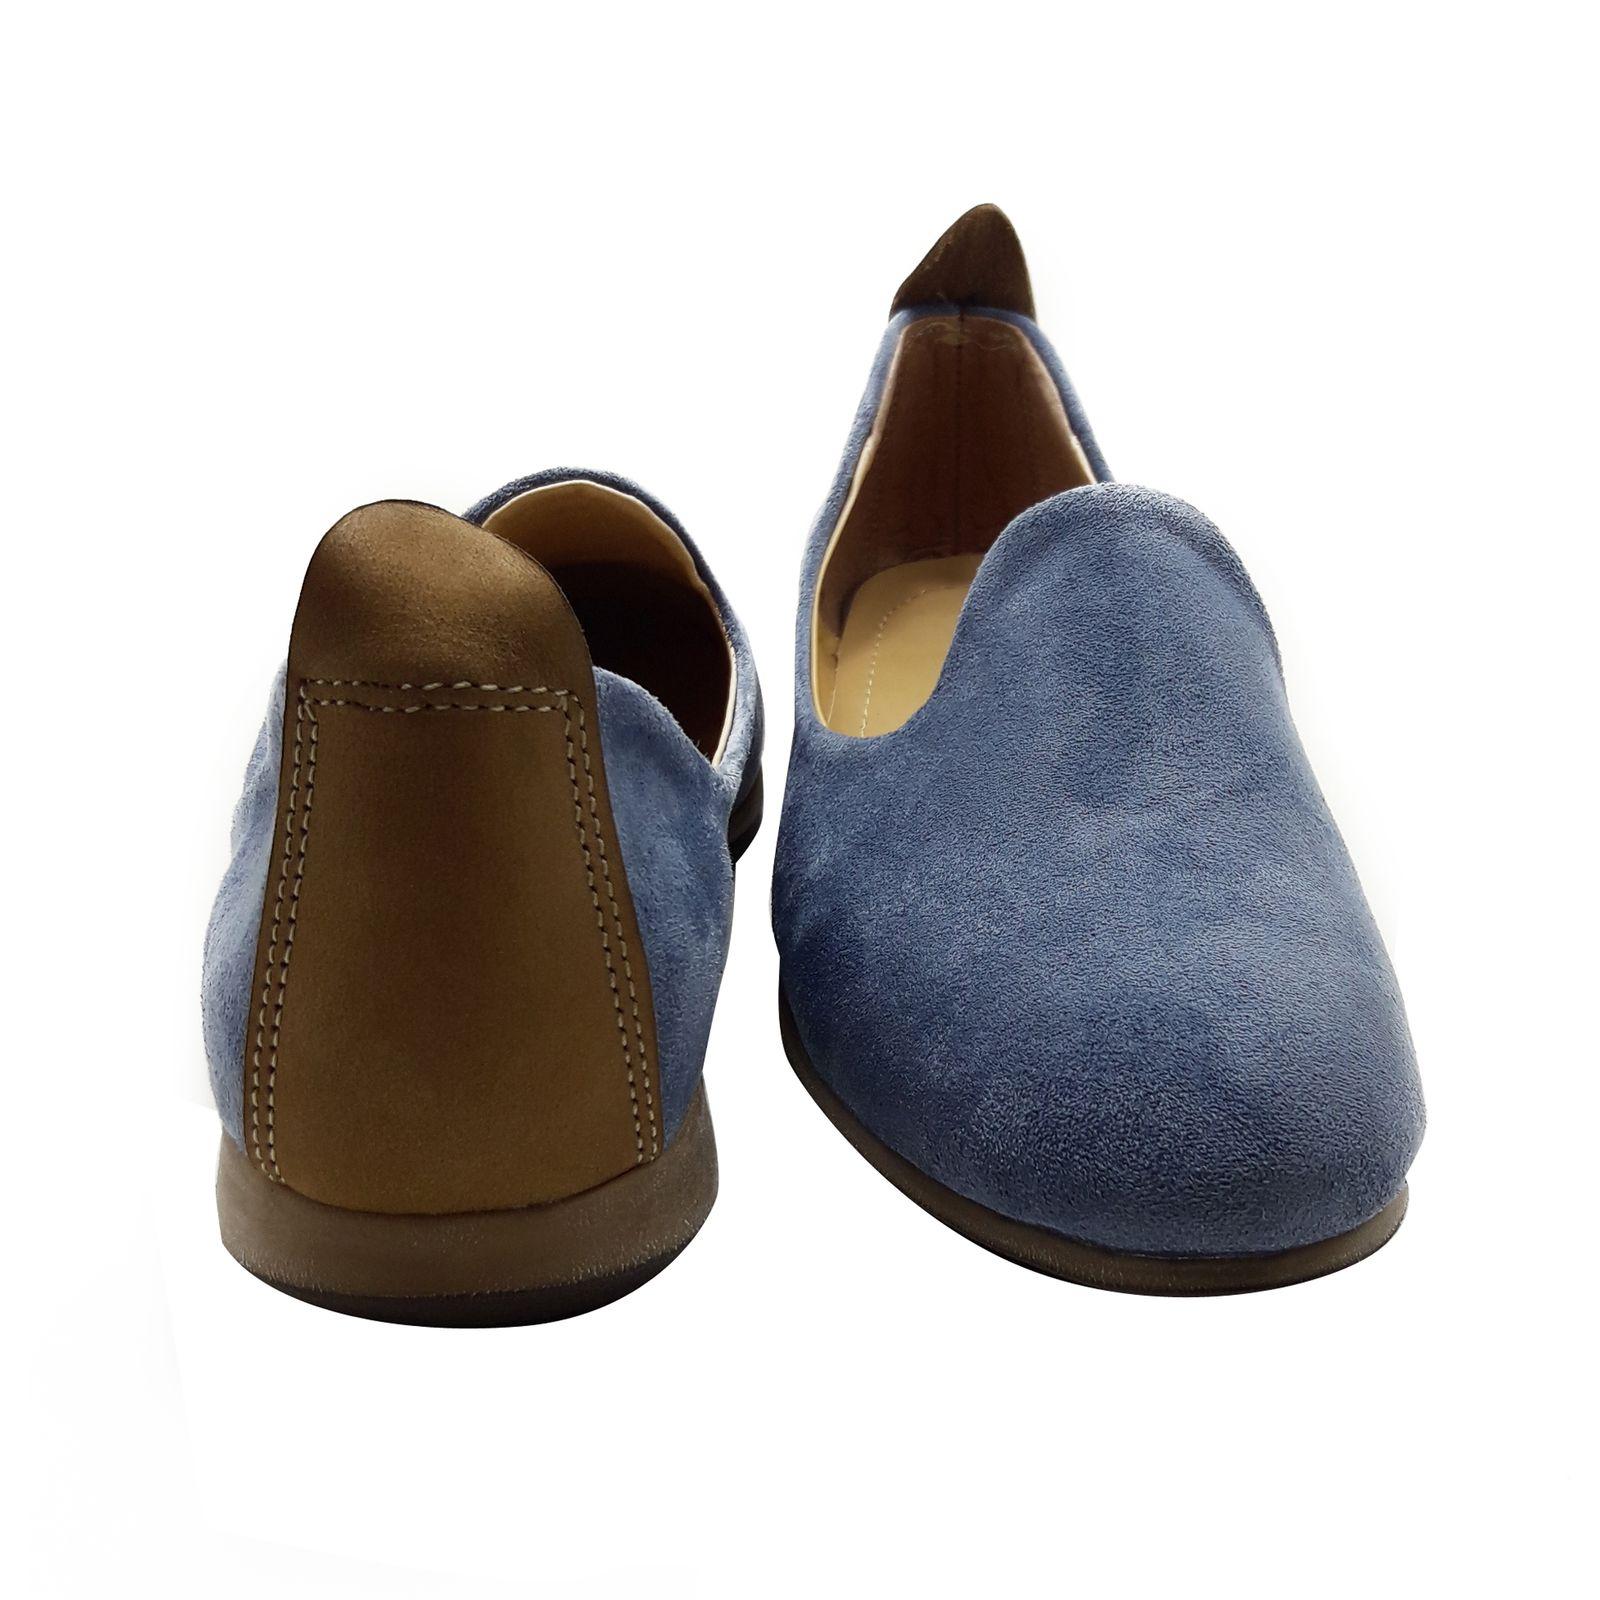 کفش  روزمره زنانه کد 8595 -  - 2